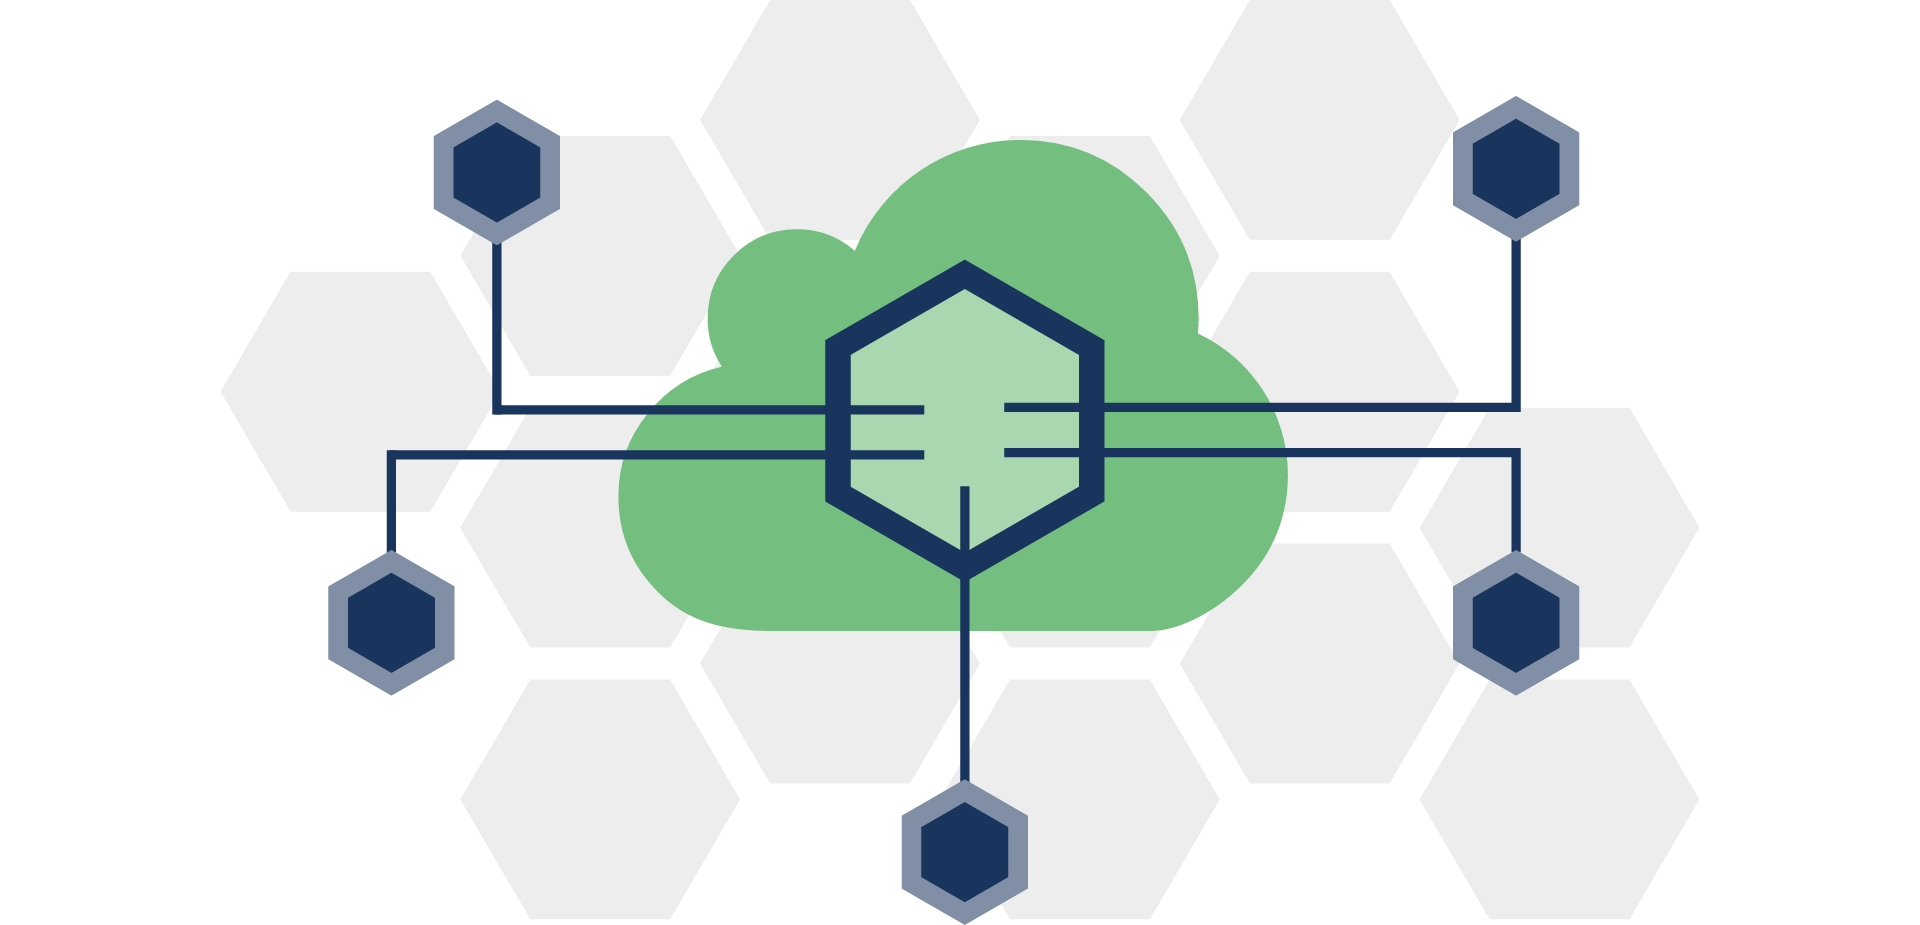 Premium Web Hosting Plans - A3 Cloud Hosting